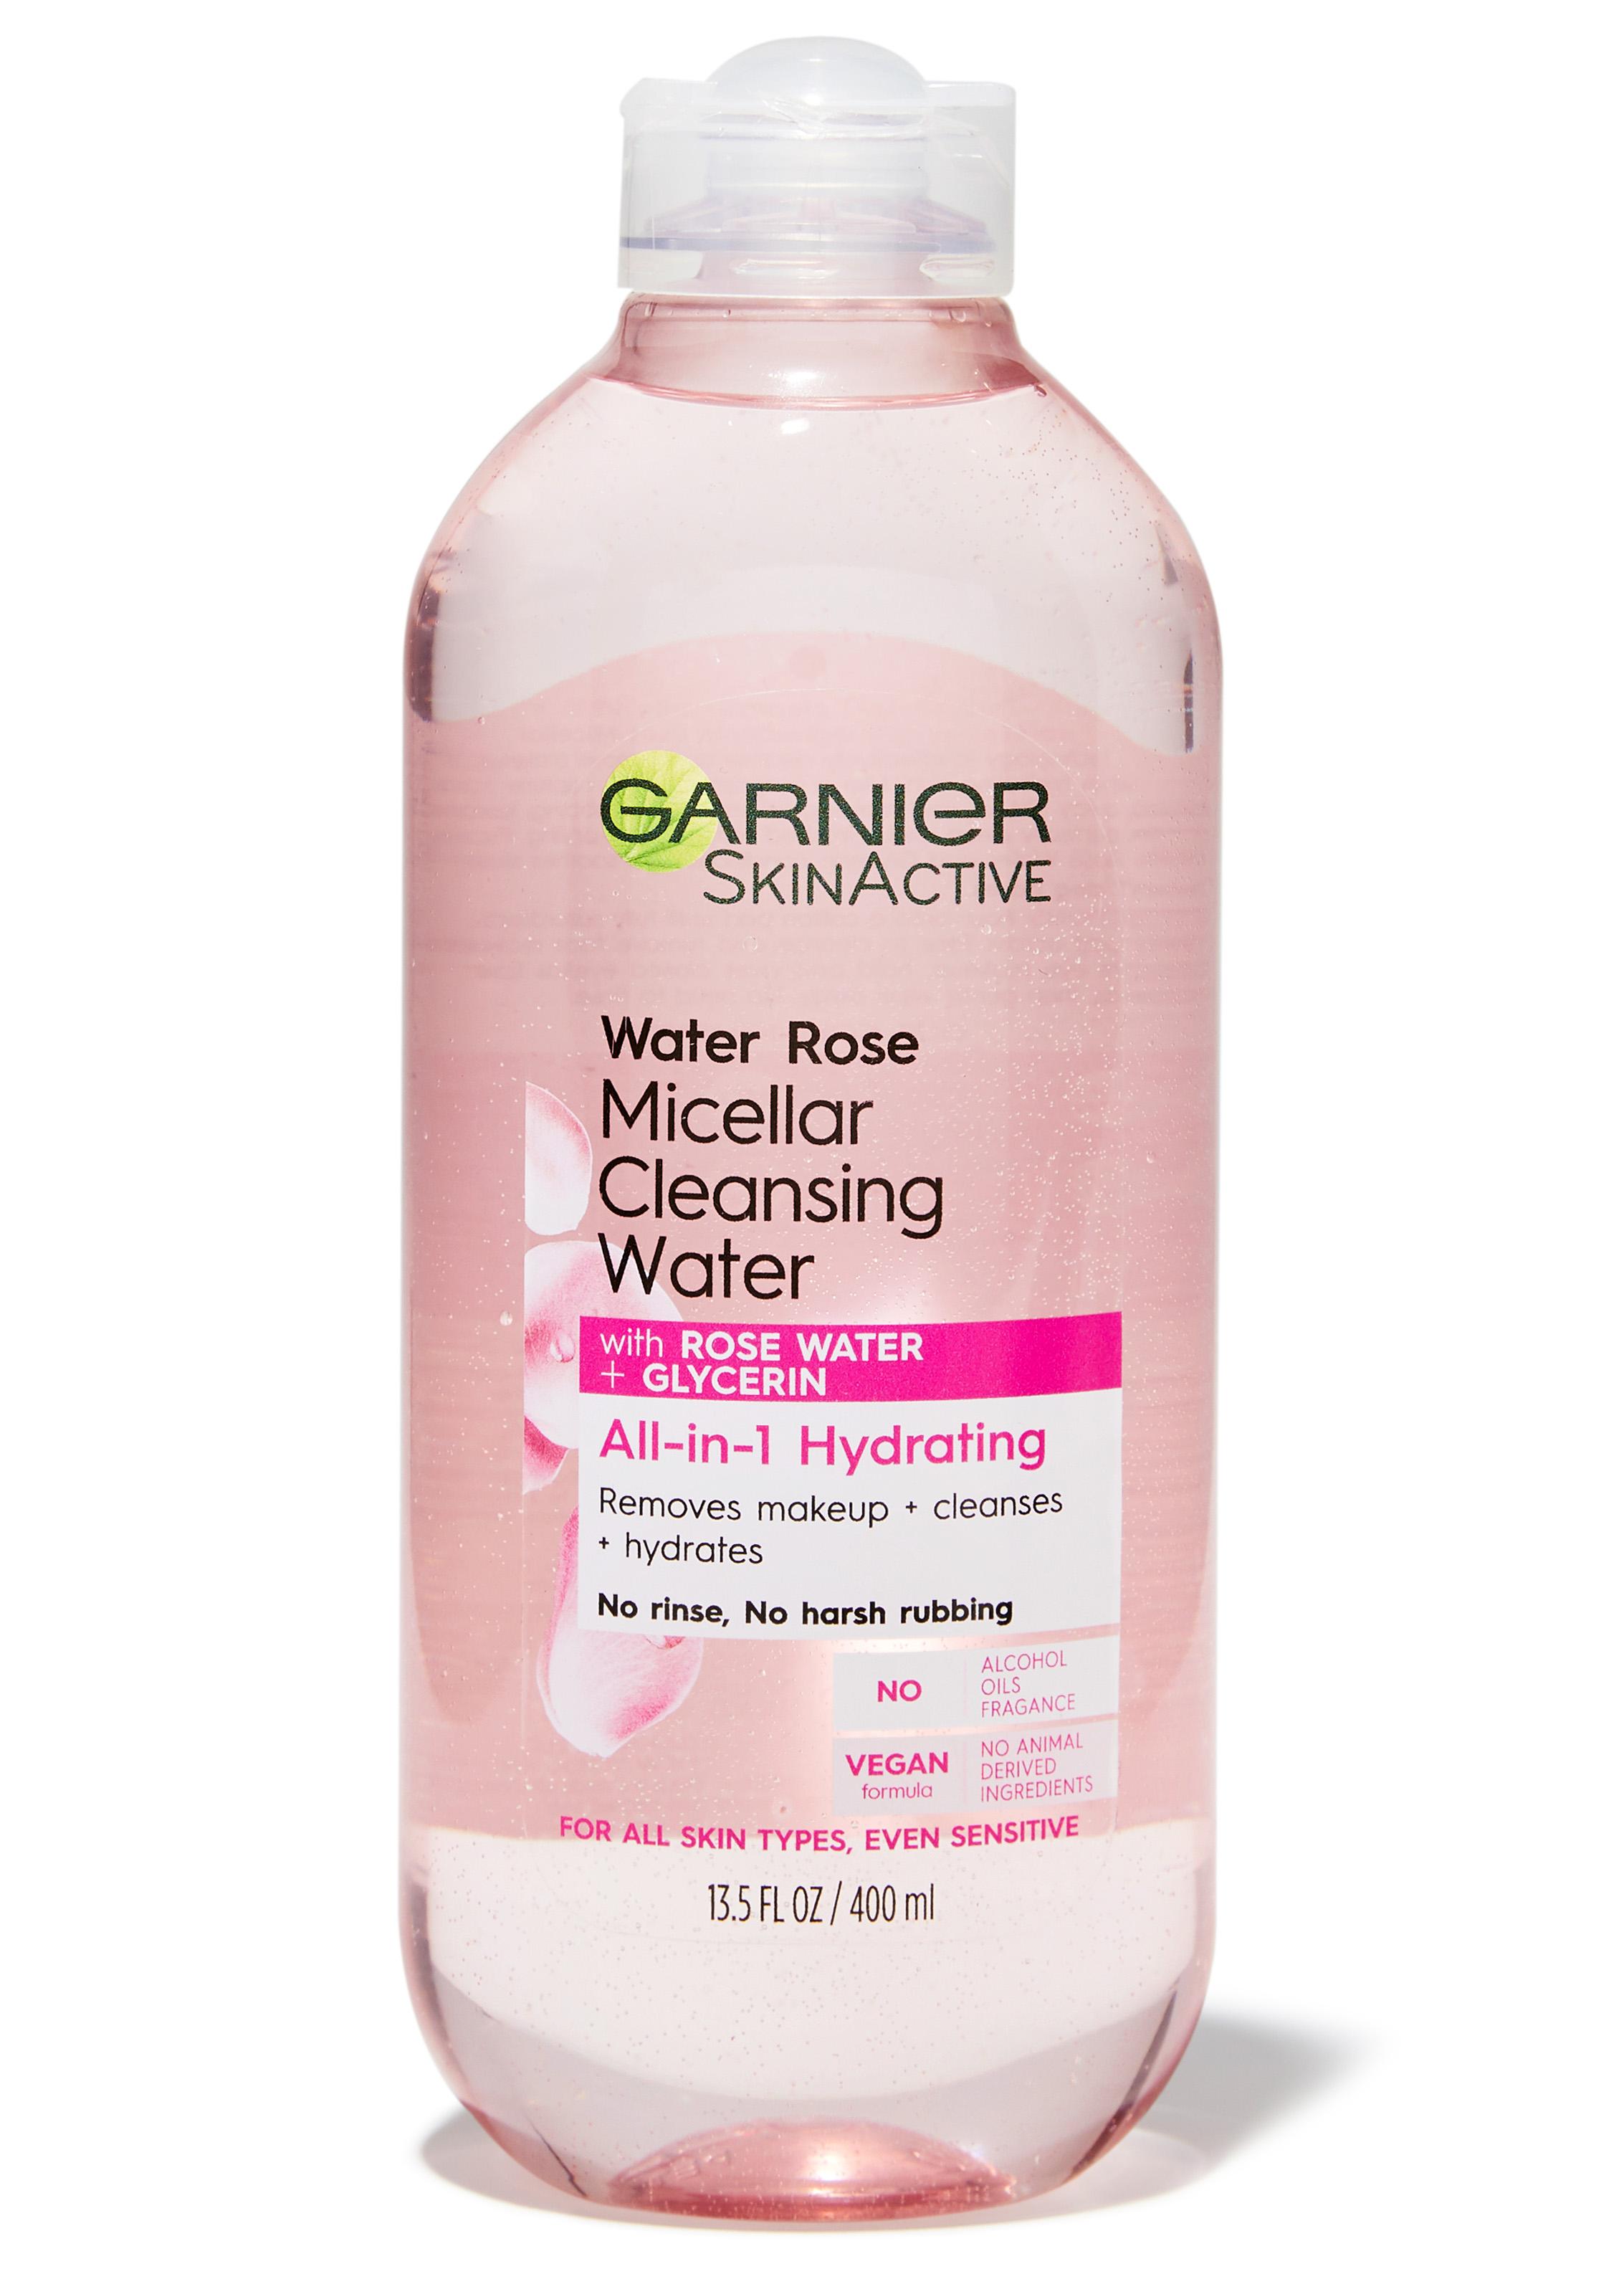 Garnier SkinActive Water Rose Micellar Cleansing Water